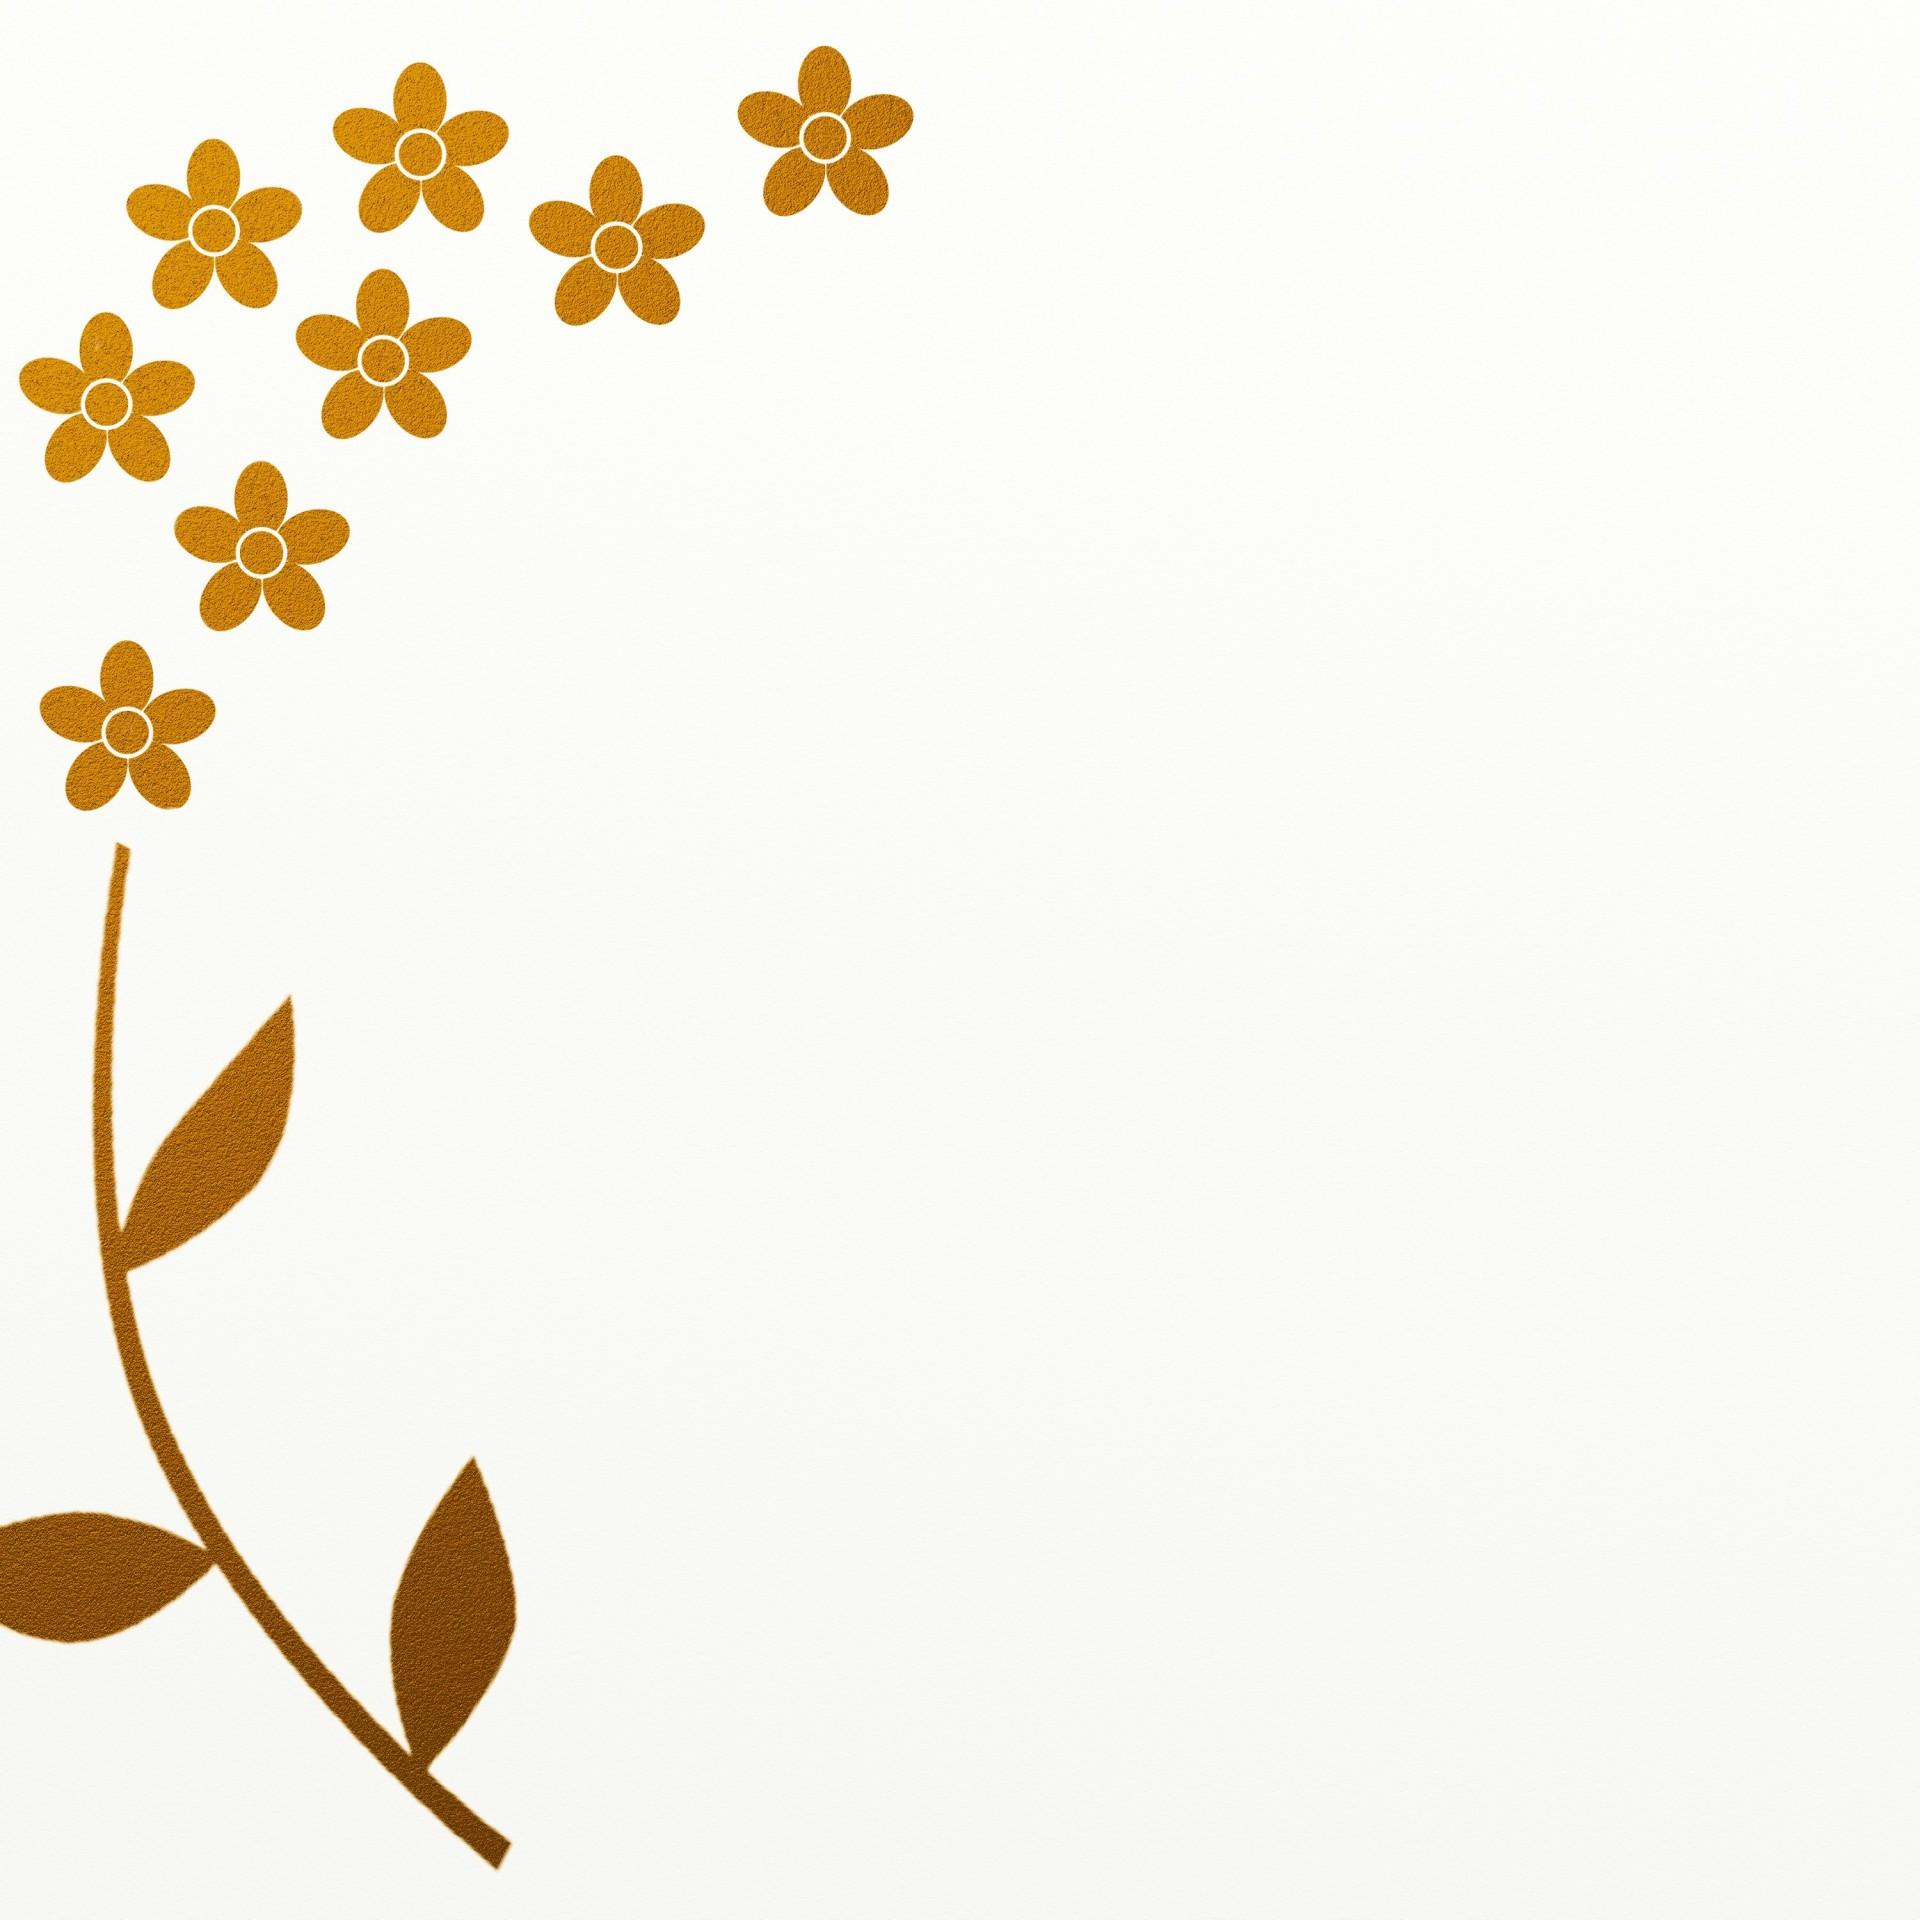 Gold Leaf Flower Border Free Stock Photo.